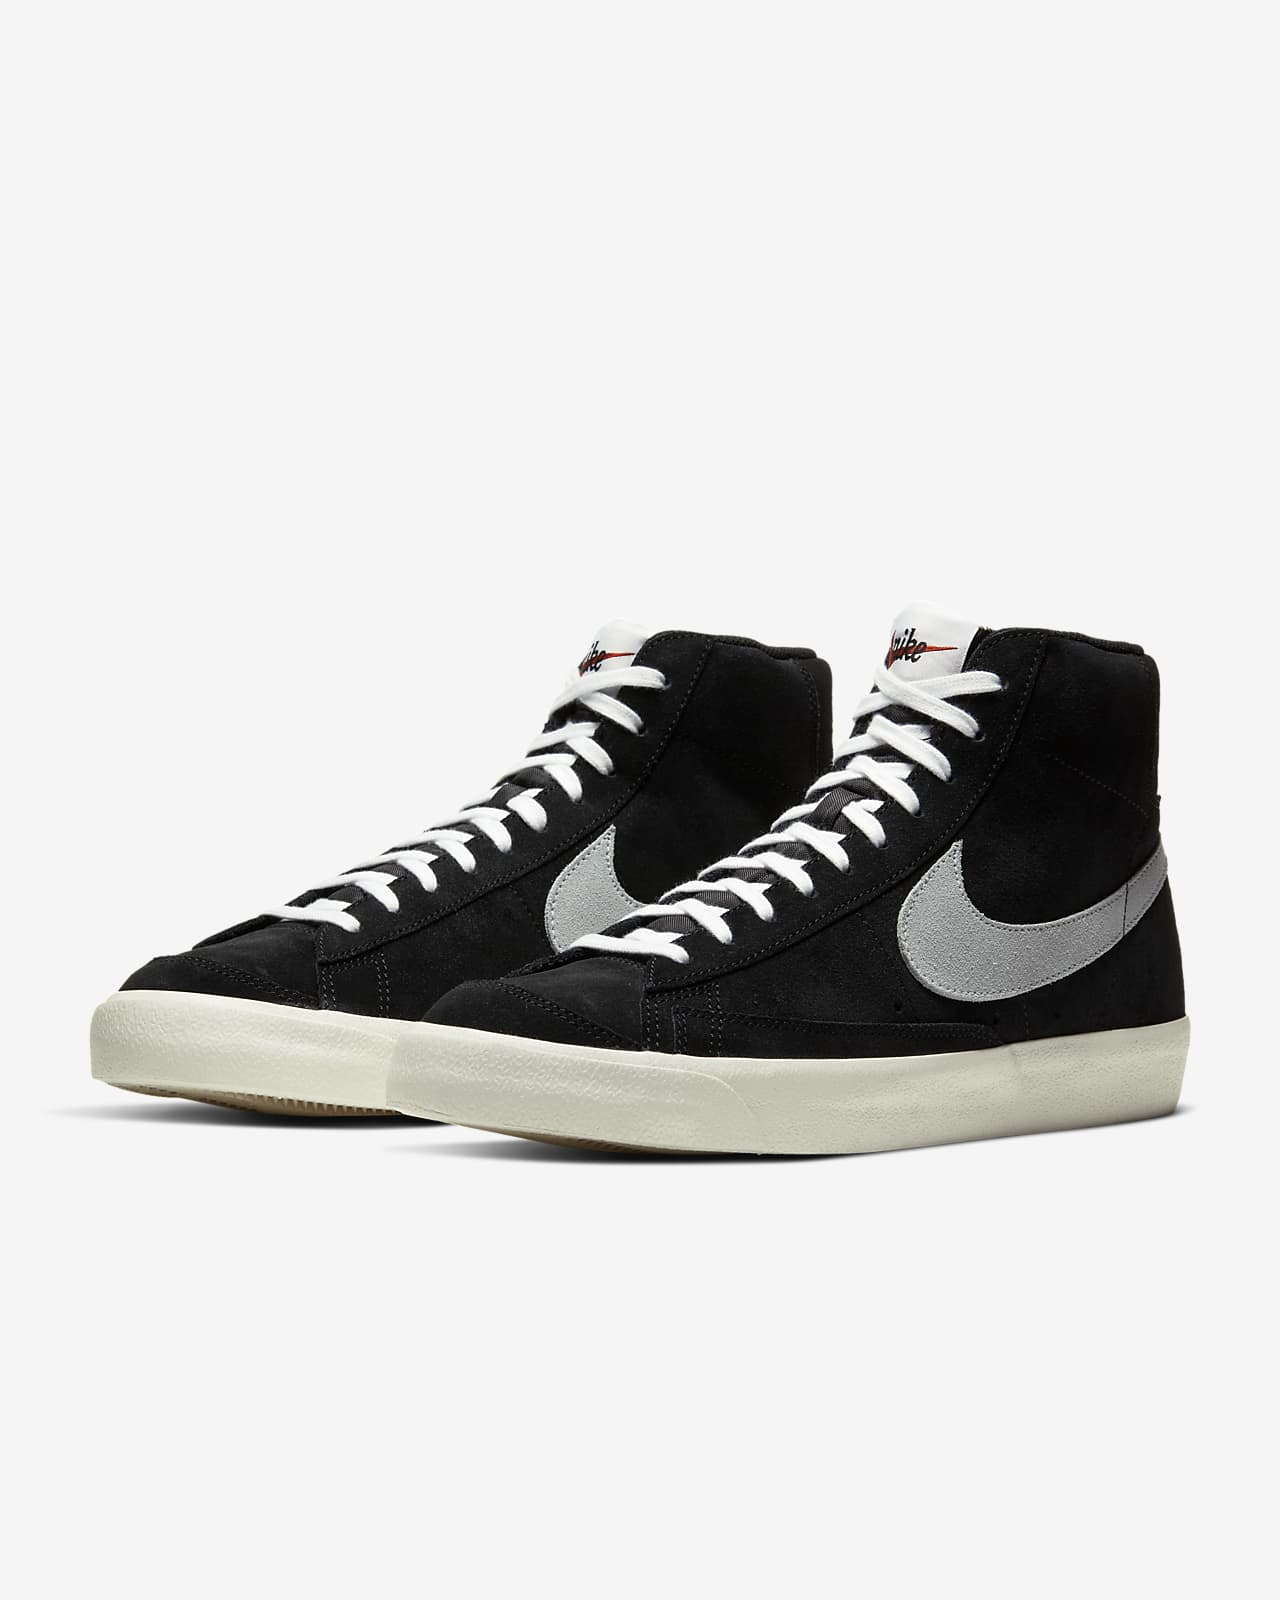 Nike Blazer Mid '77 Shoe. Nike SA